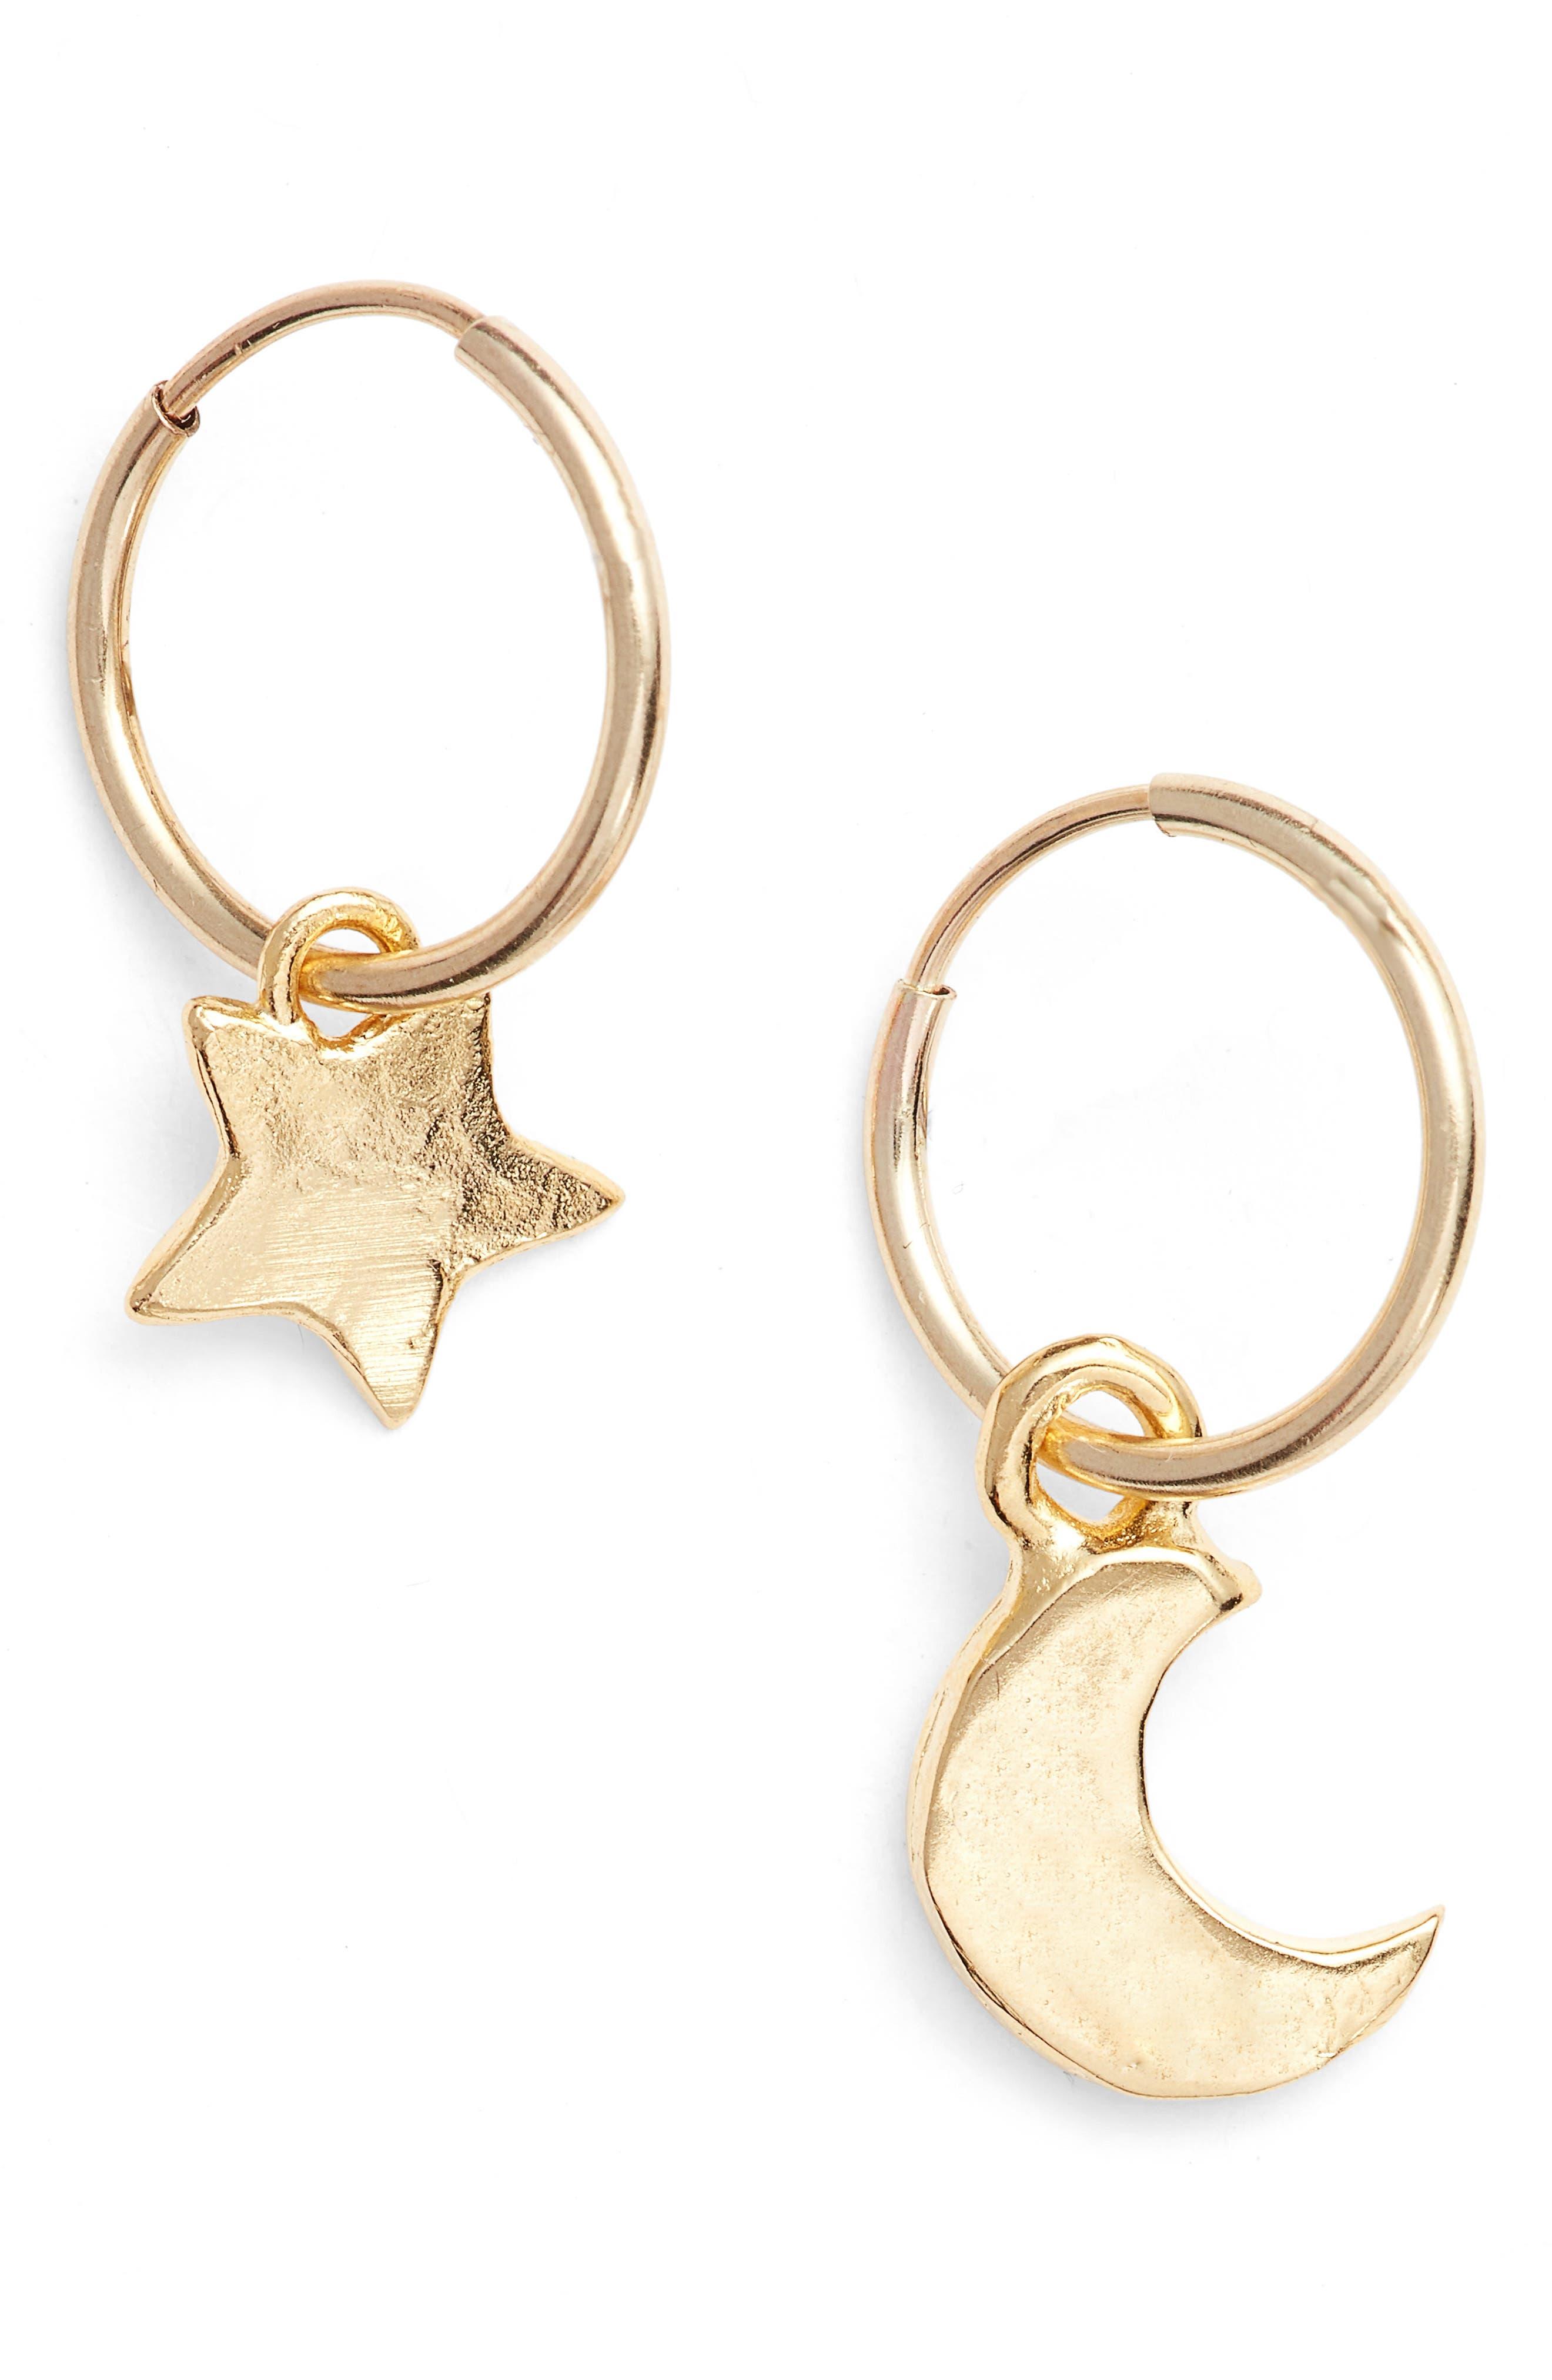 Alternate Image 1 Selected - Britt Bolton Moon & Star Drop Earrings